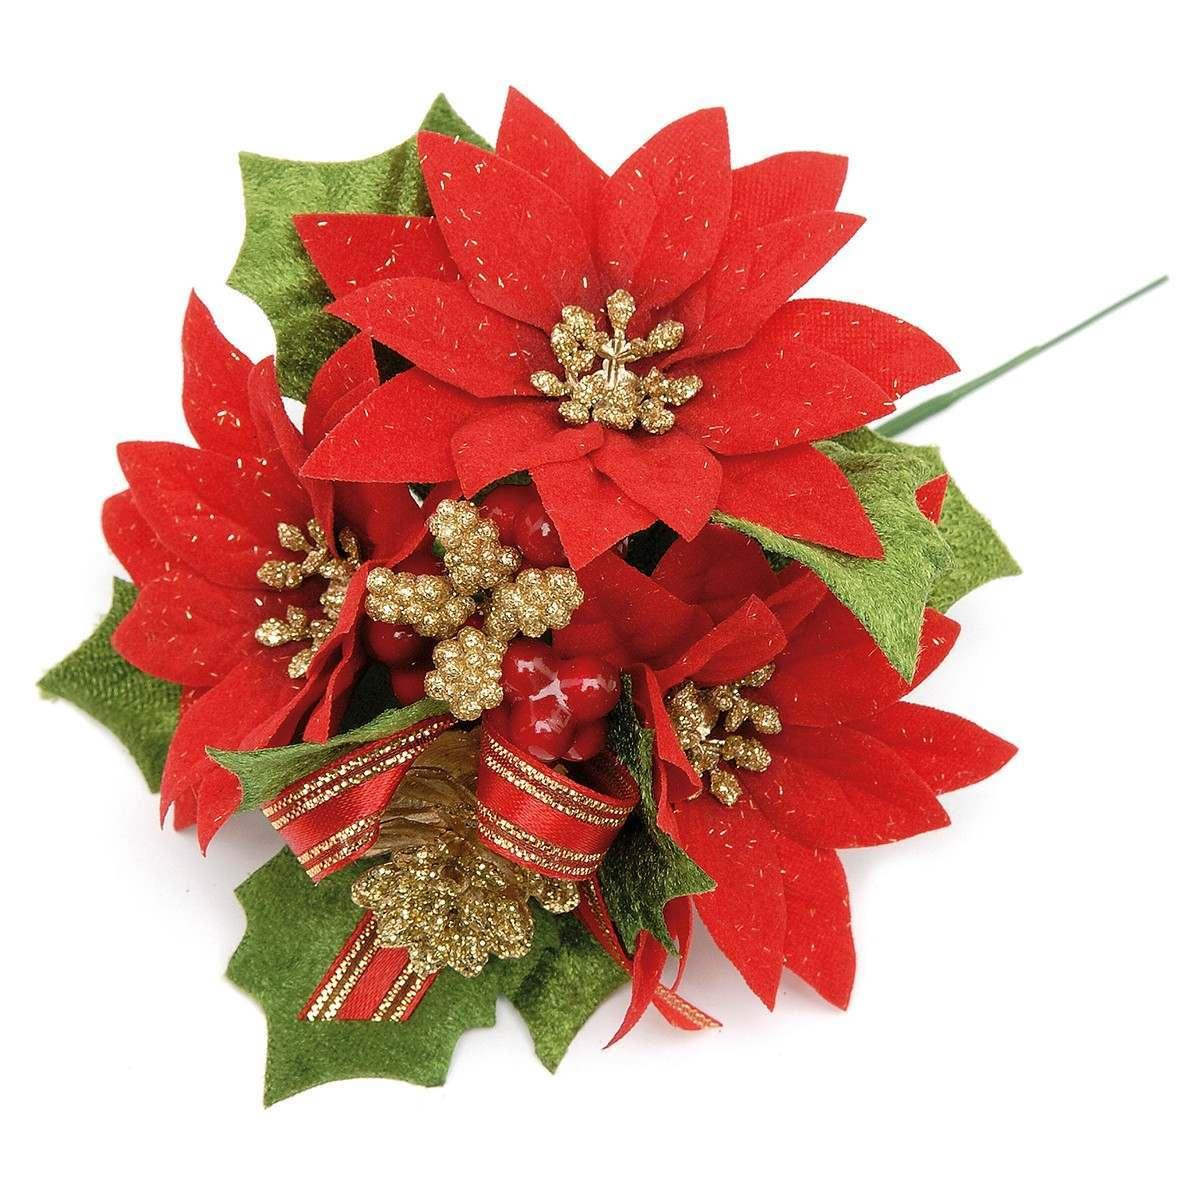 11cm Red Glittered Poinsettia Pick